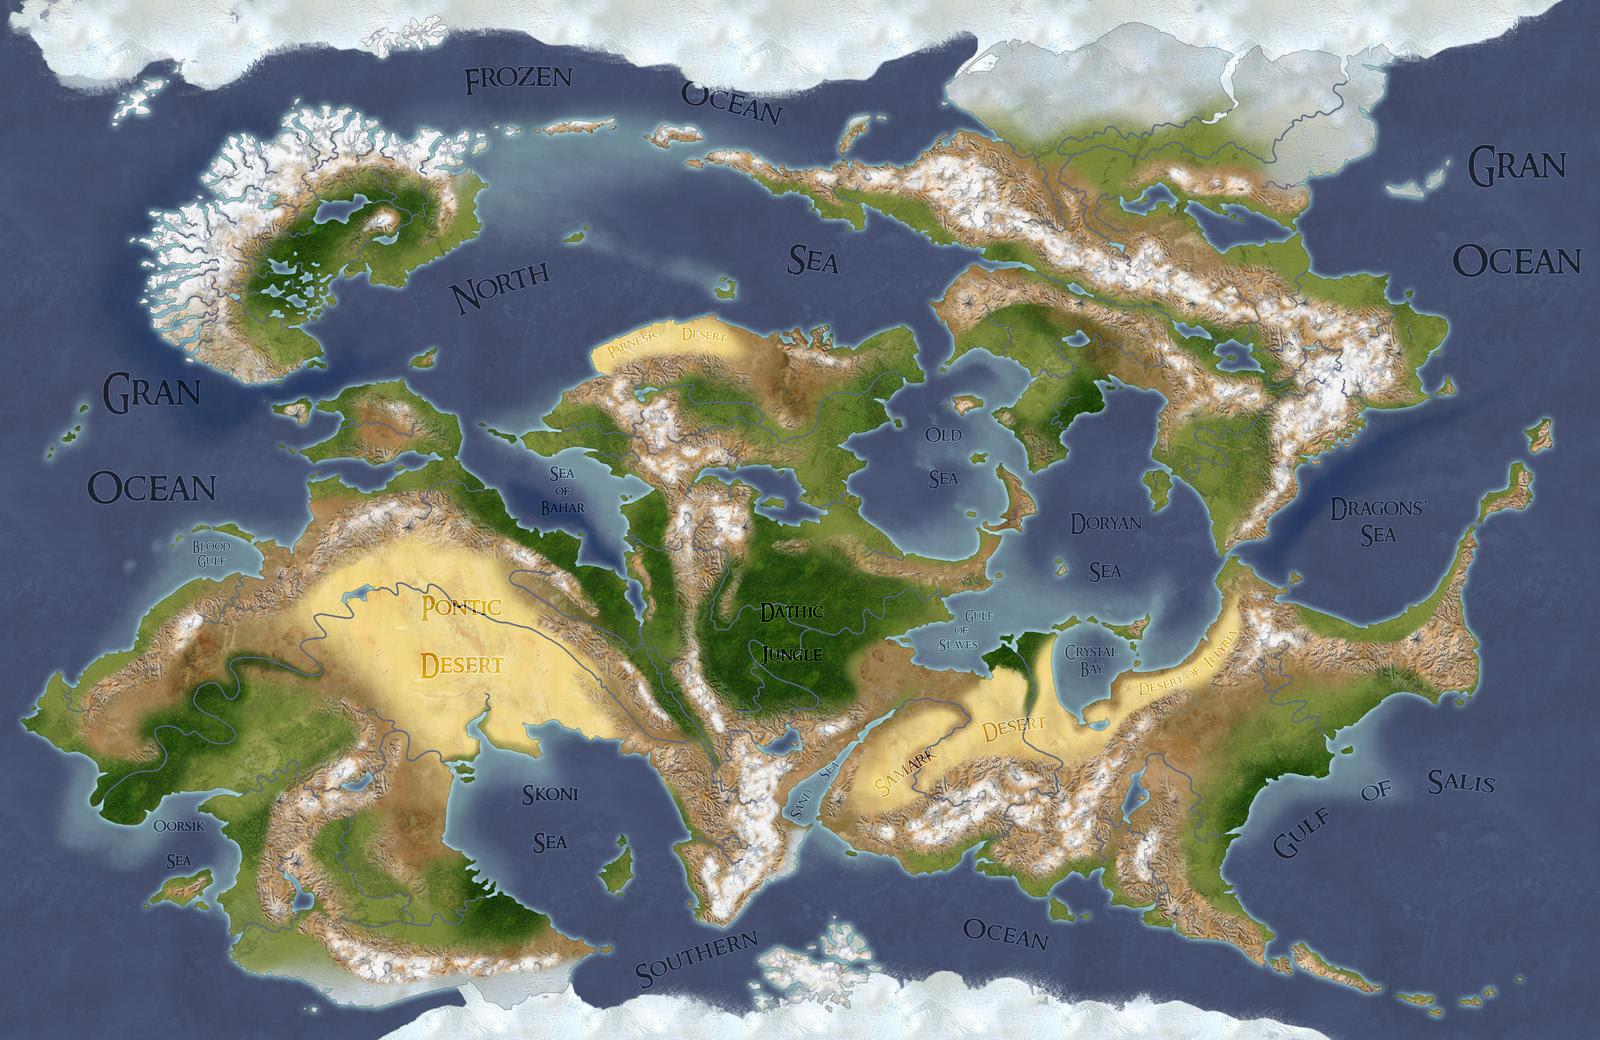 Fantasy World Map Creator Free Map Of Us Western States